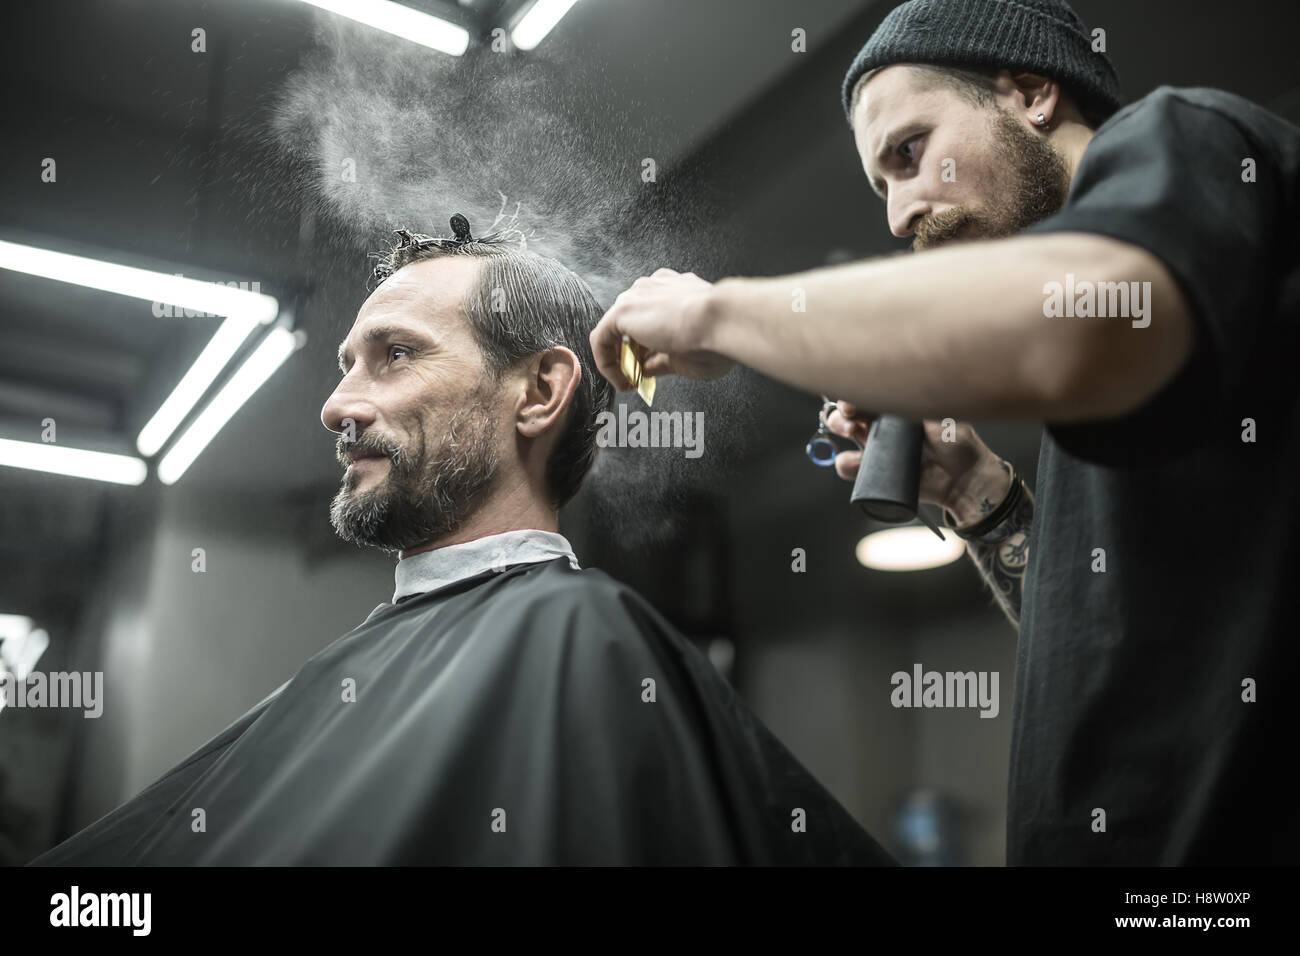 Barber is using spray bottle - Stock Image